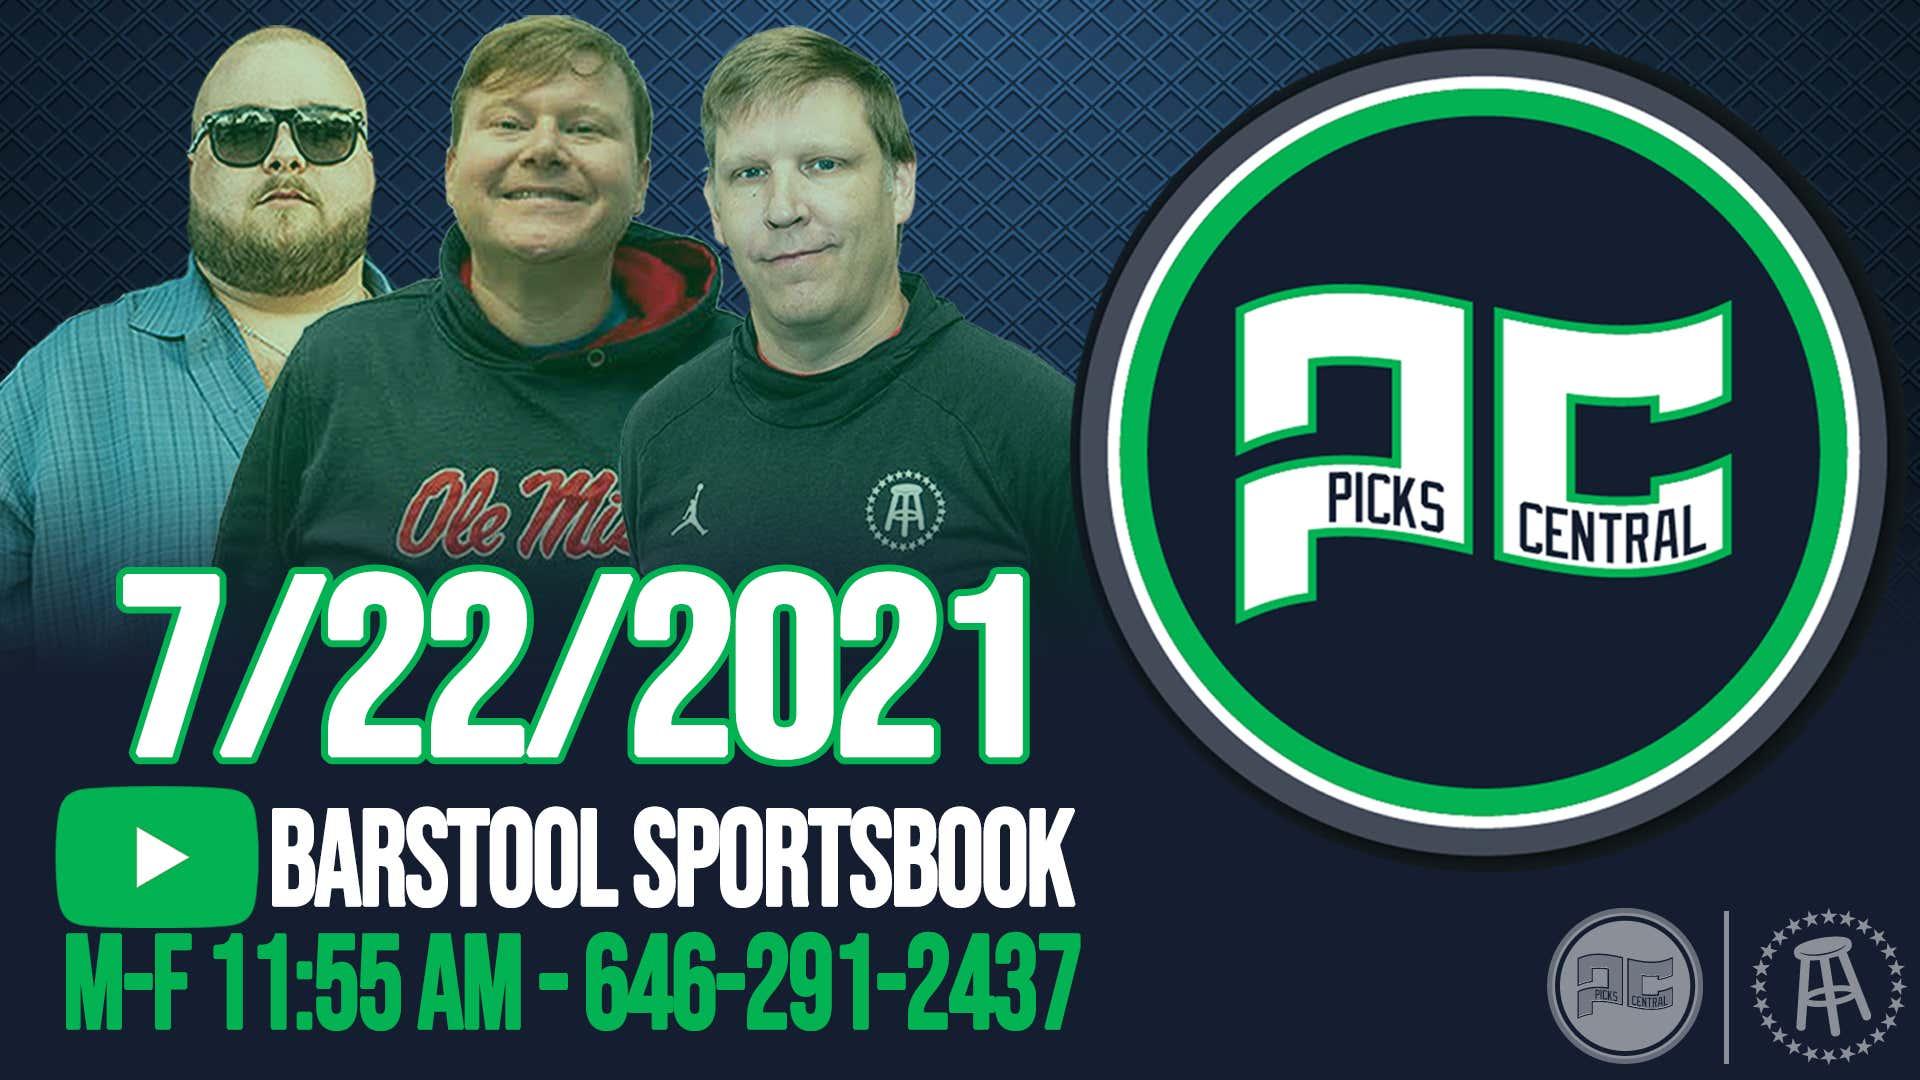 Barstool Sports Picks Central with Brandon Walker & Co.   Thursday, July 22, 2021